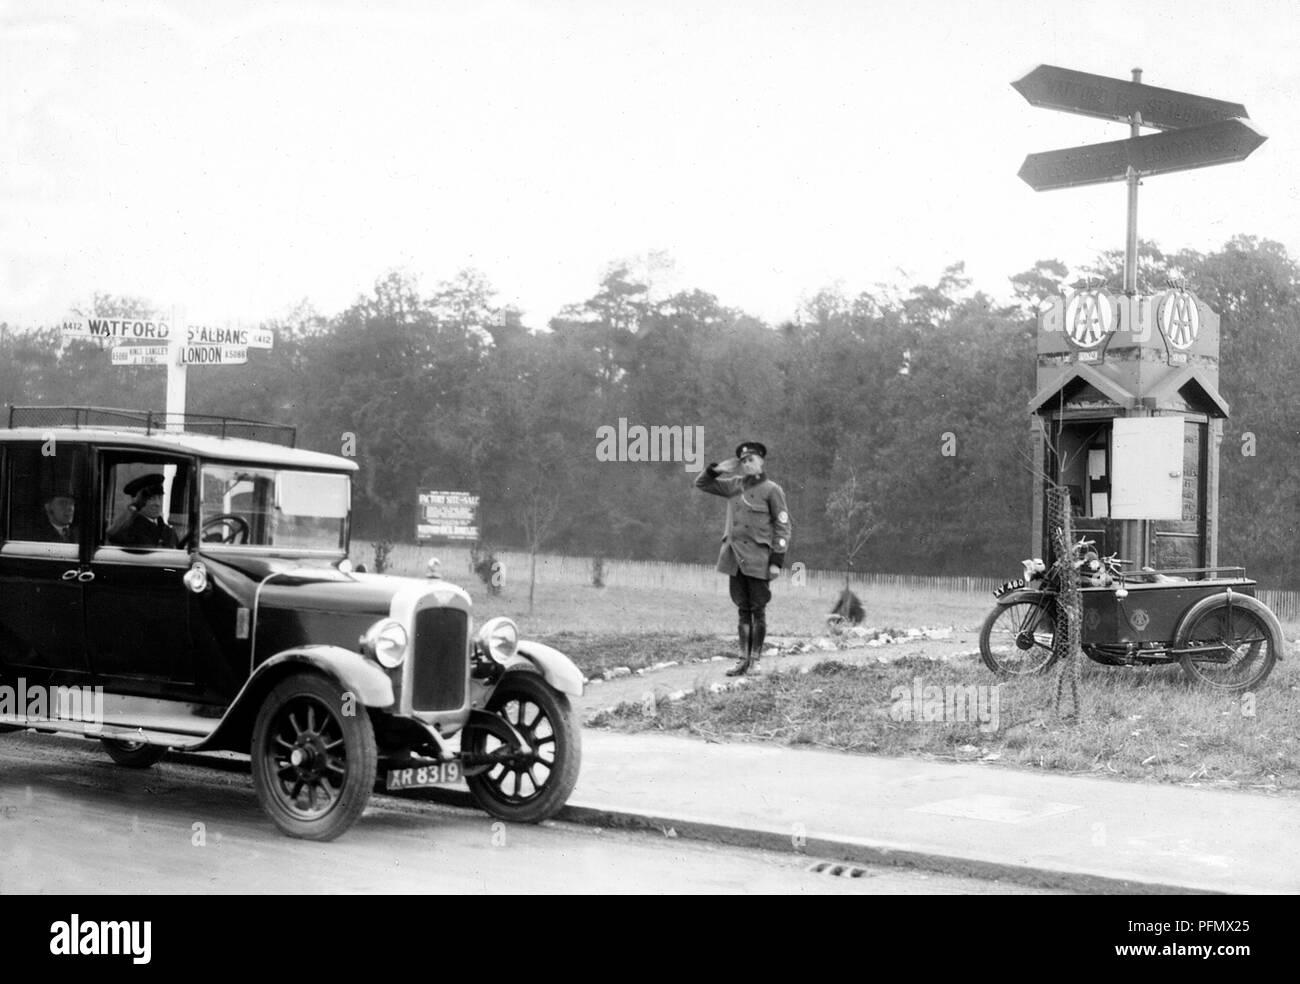 AA patrolman saluting motorist at Garston near Watford, 1920s maybe - Stock Image